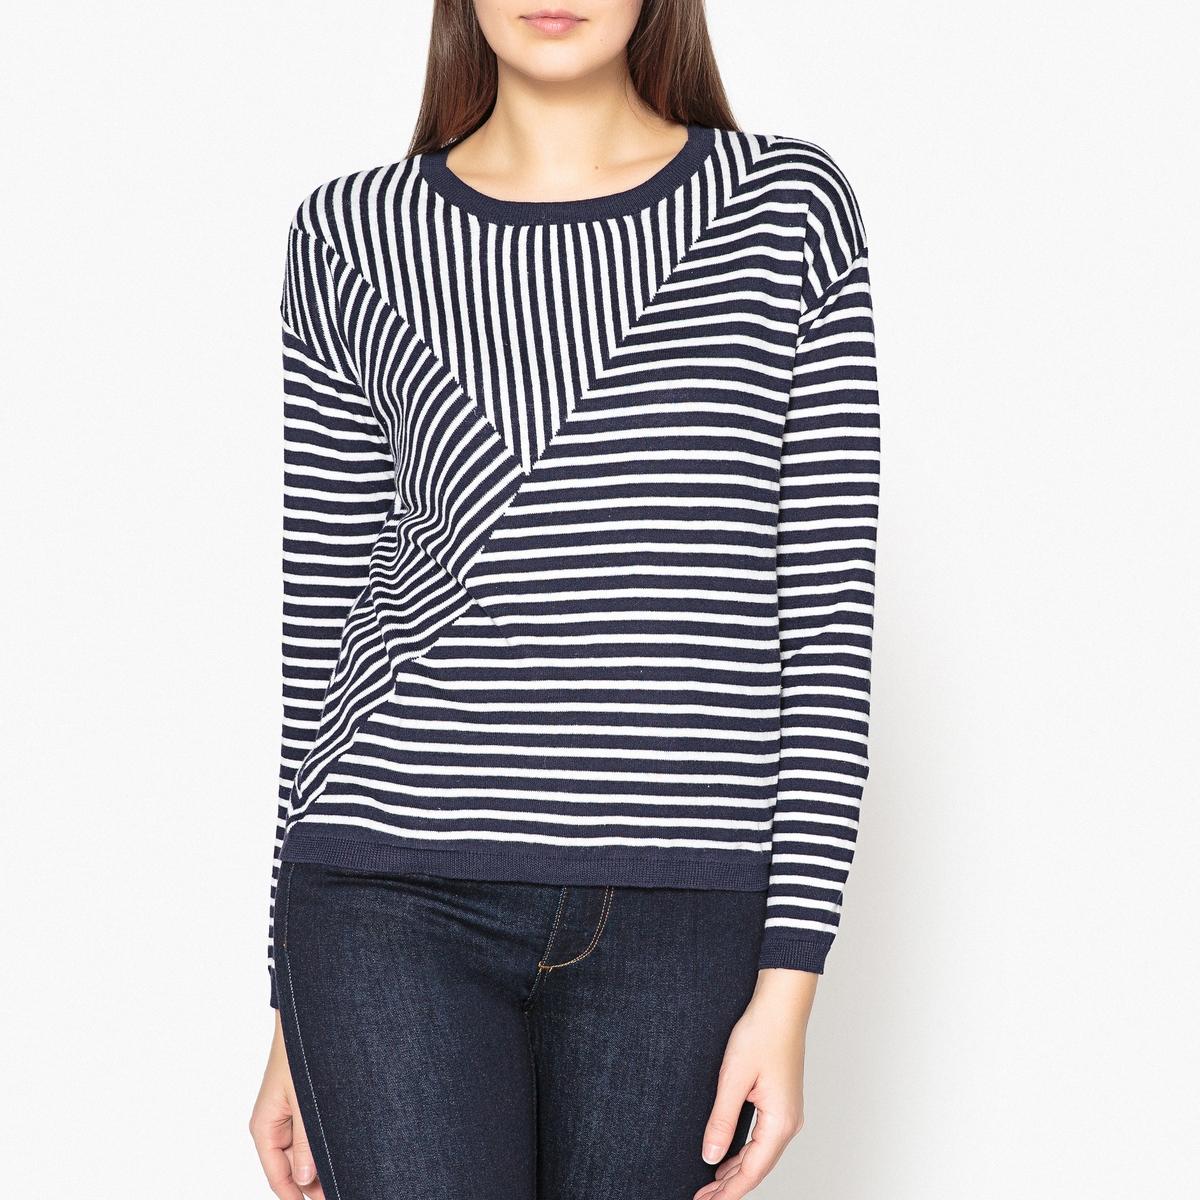 Пуловер HARTFORD 6349454 от LaRedoute